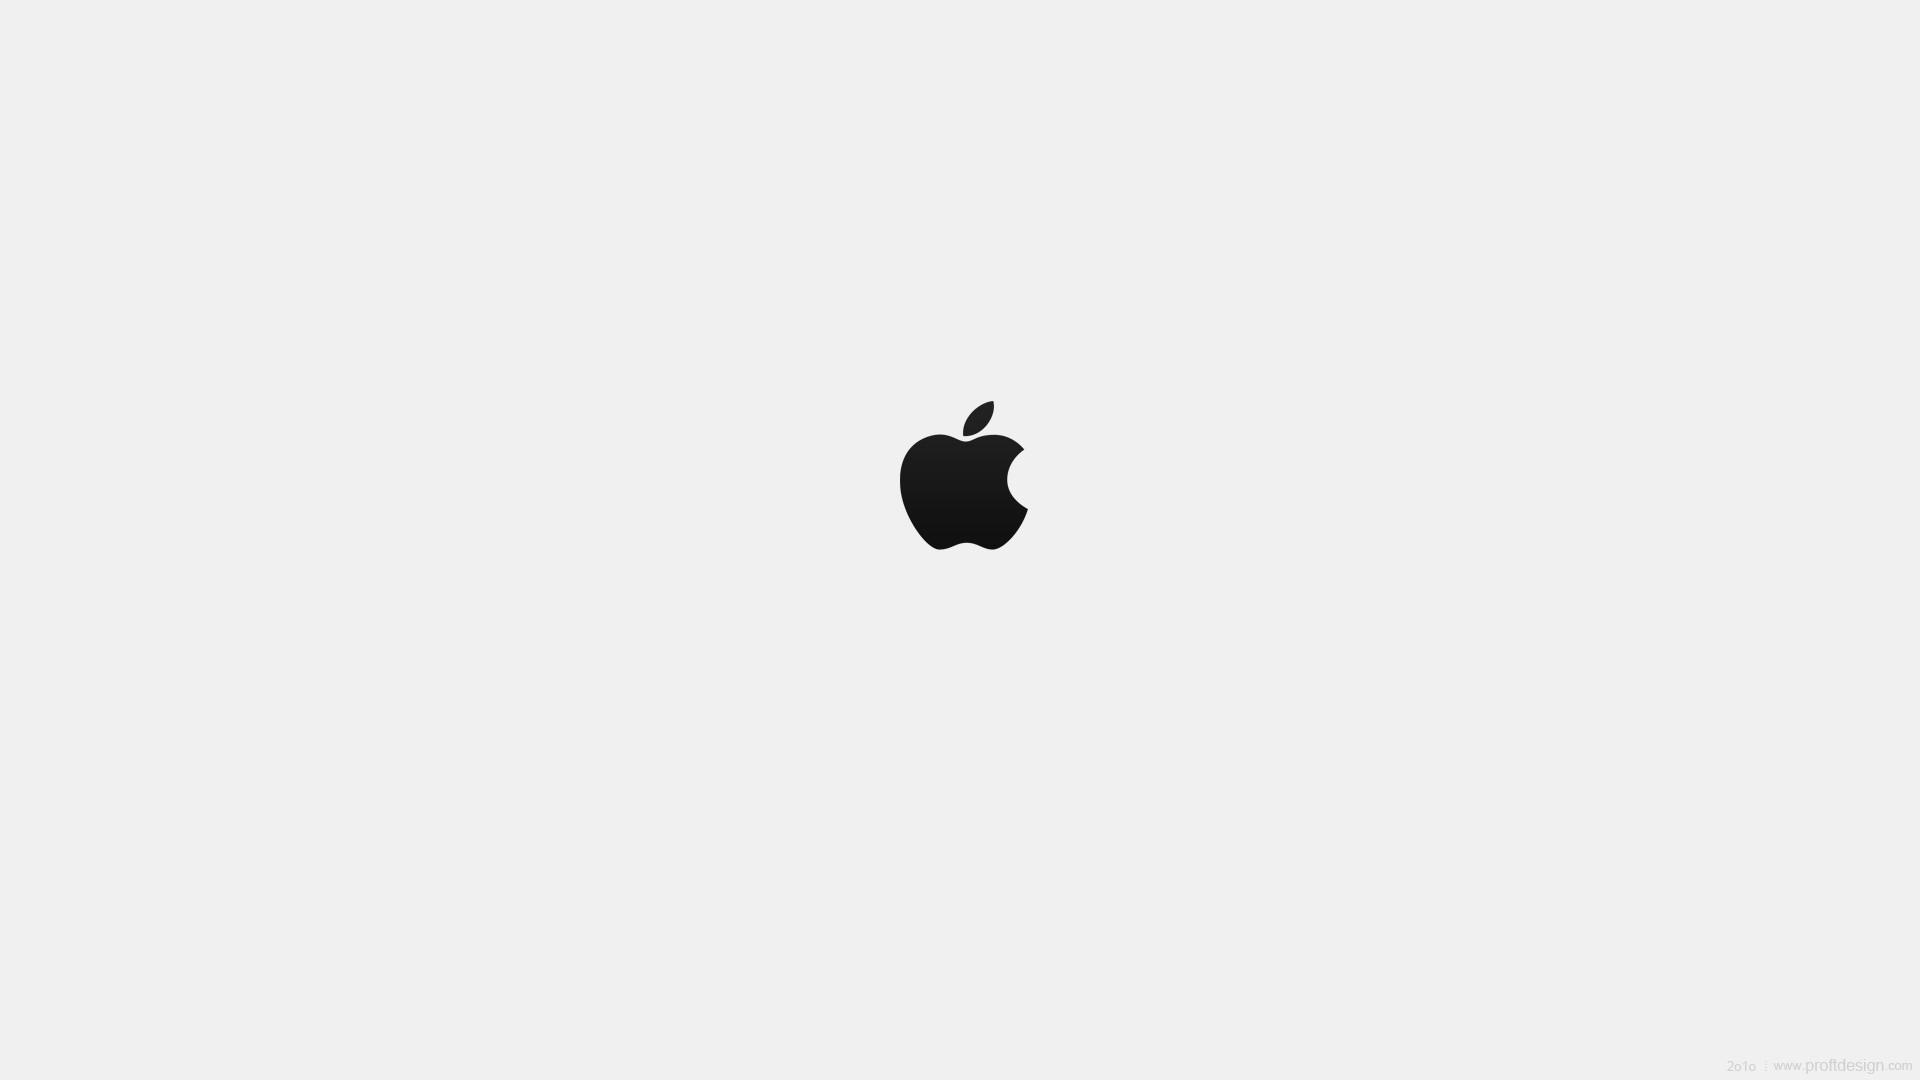 apple wallpaper download free wallpapers for desktop computers